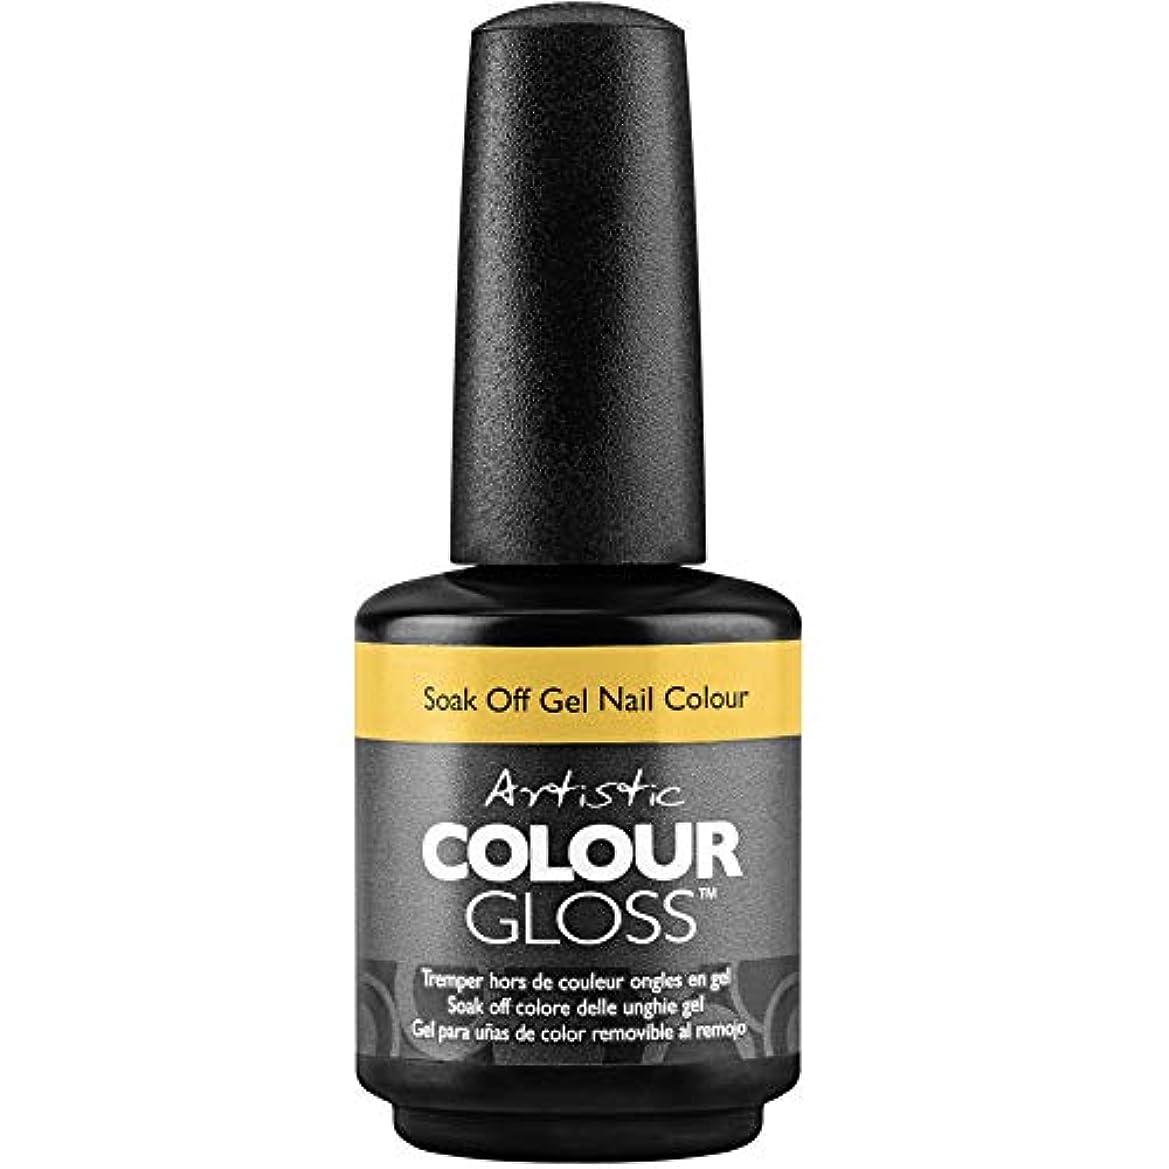 複製中間密輸Artistic Colour Gloss - Sun's Out, Buns Out - 0.5oz / 15ml